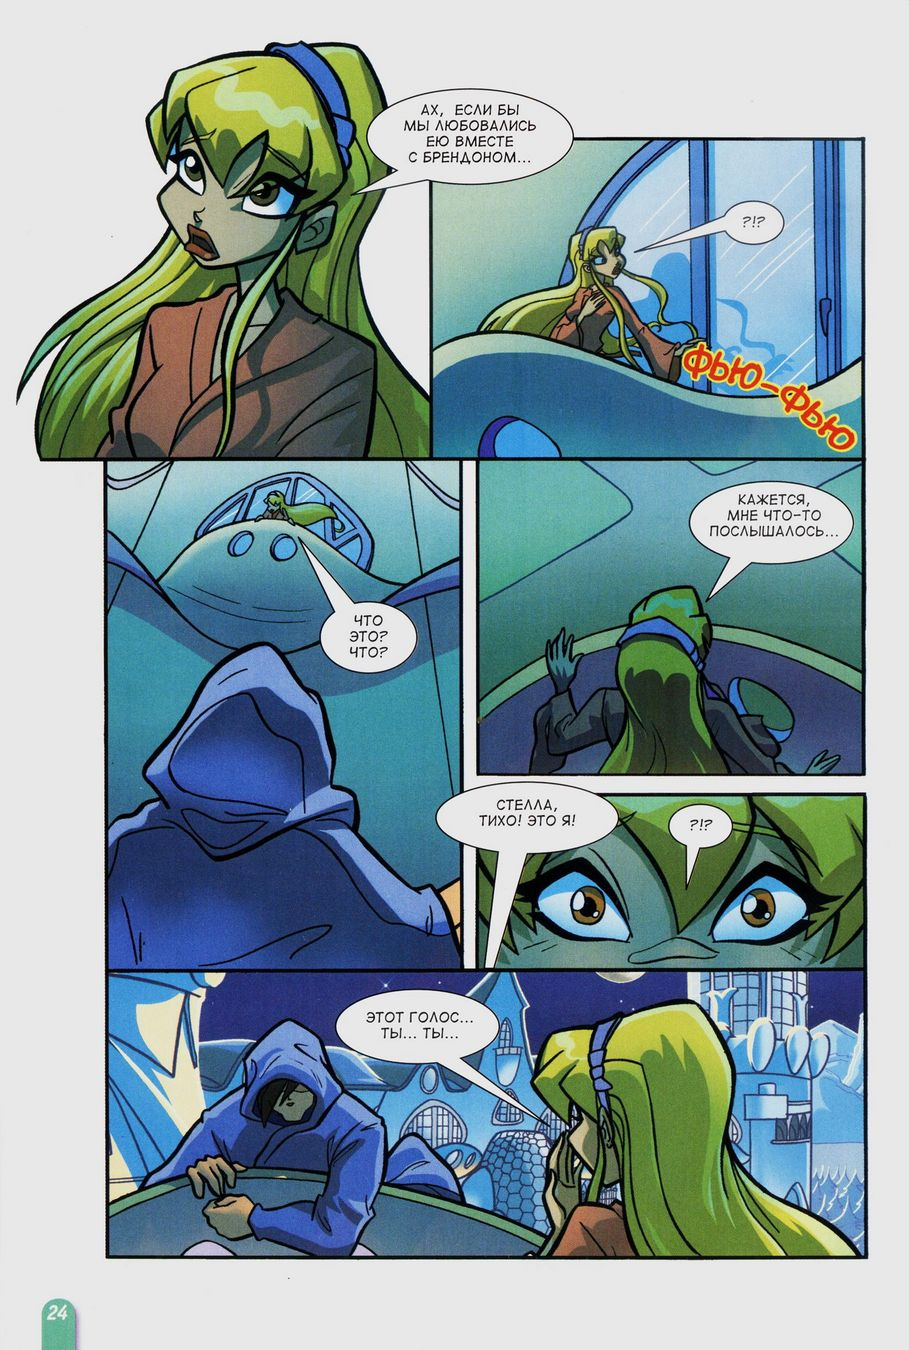 Комикс Винкс Winx - Волшебник Камуд (Журнал Винкс №6 2011) - стр. 24